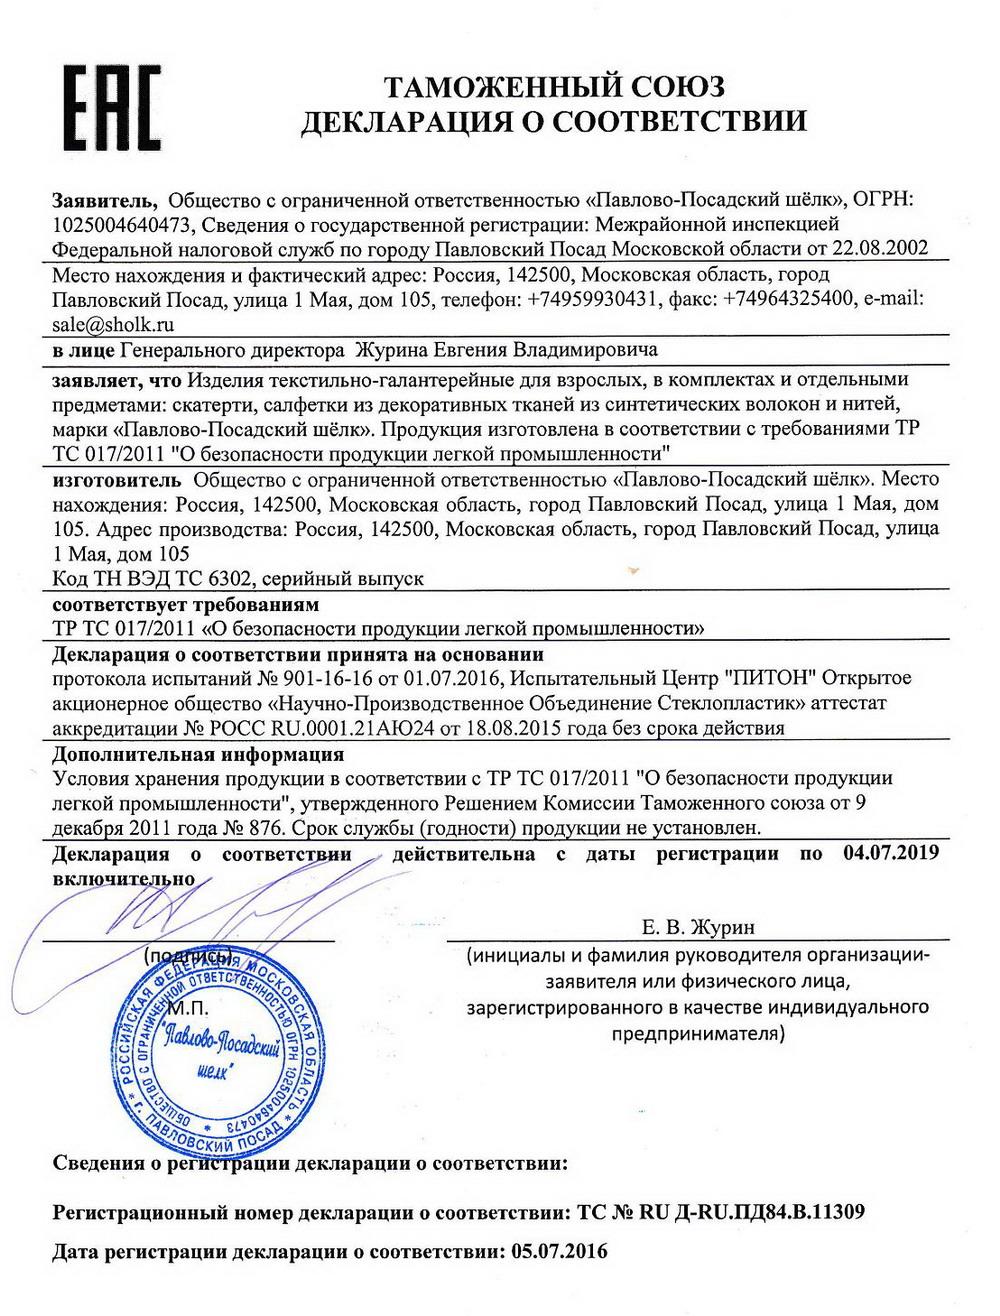 Таможенная декларация на скатерти Павлов Посад